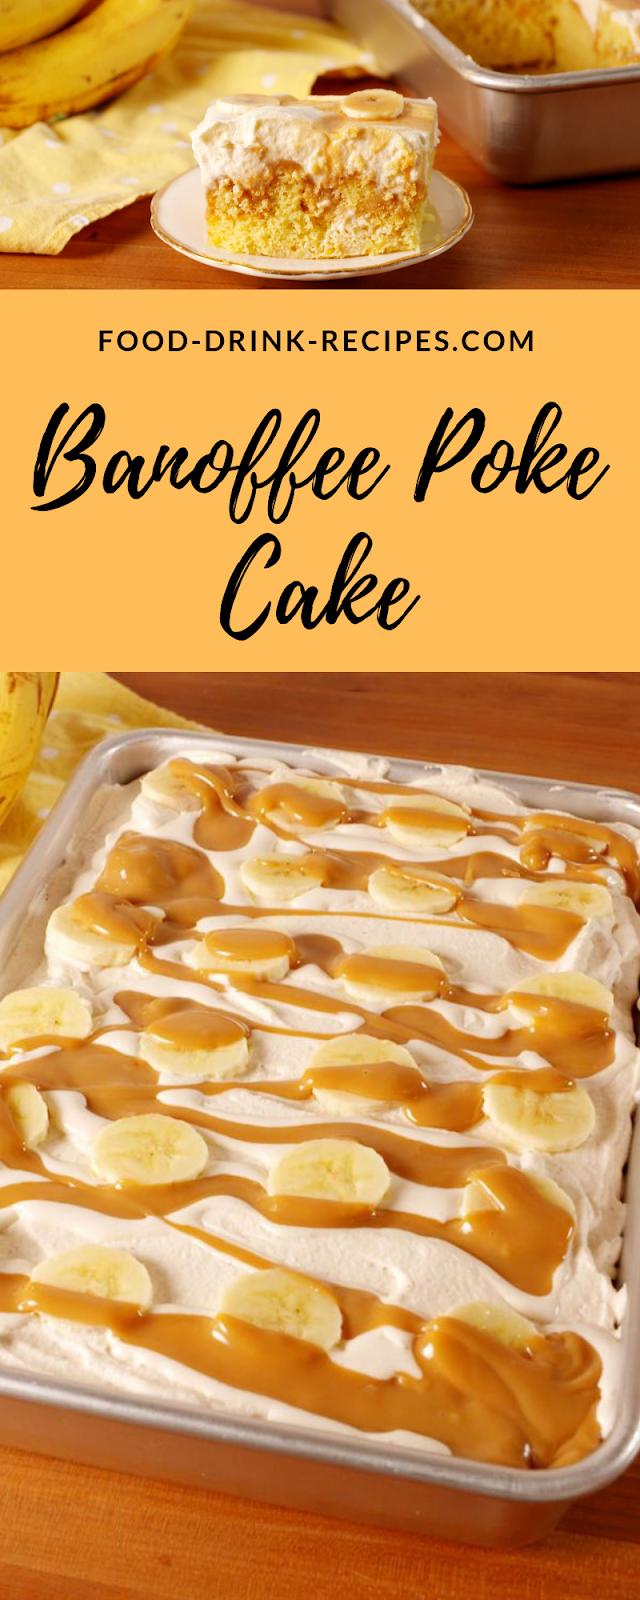 Banoffee Poke Cake - food-drink-recipes.com